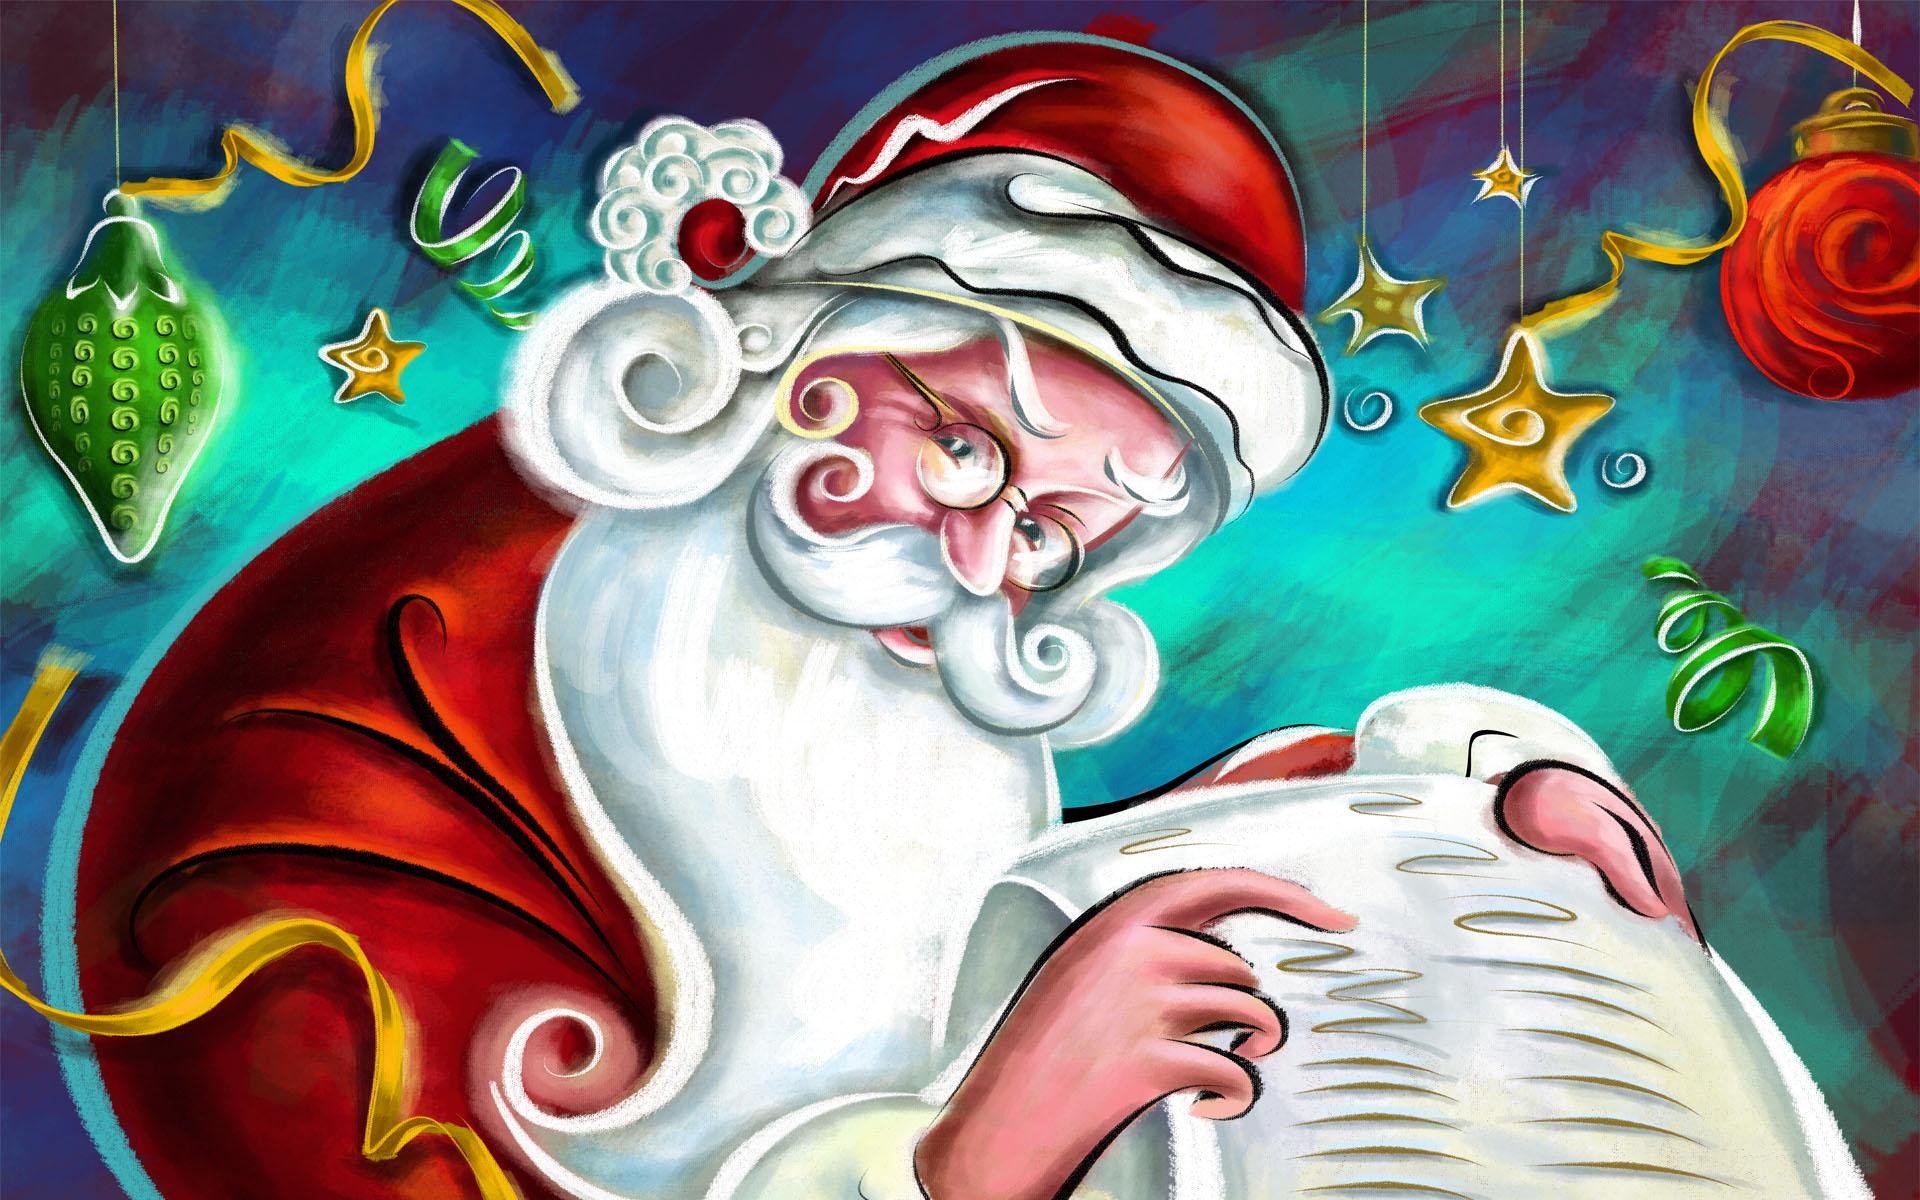 Sfondi Babbo Natale.Sfondi Natalizi Sfondissimo Sfondi Screensaver Gratis